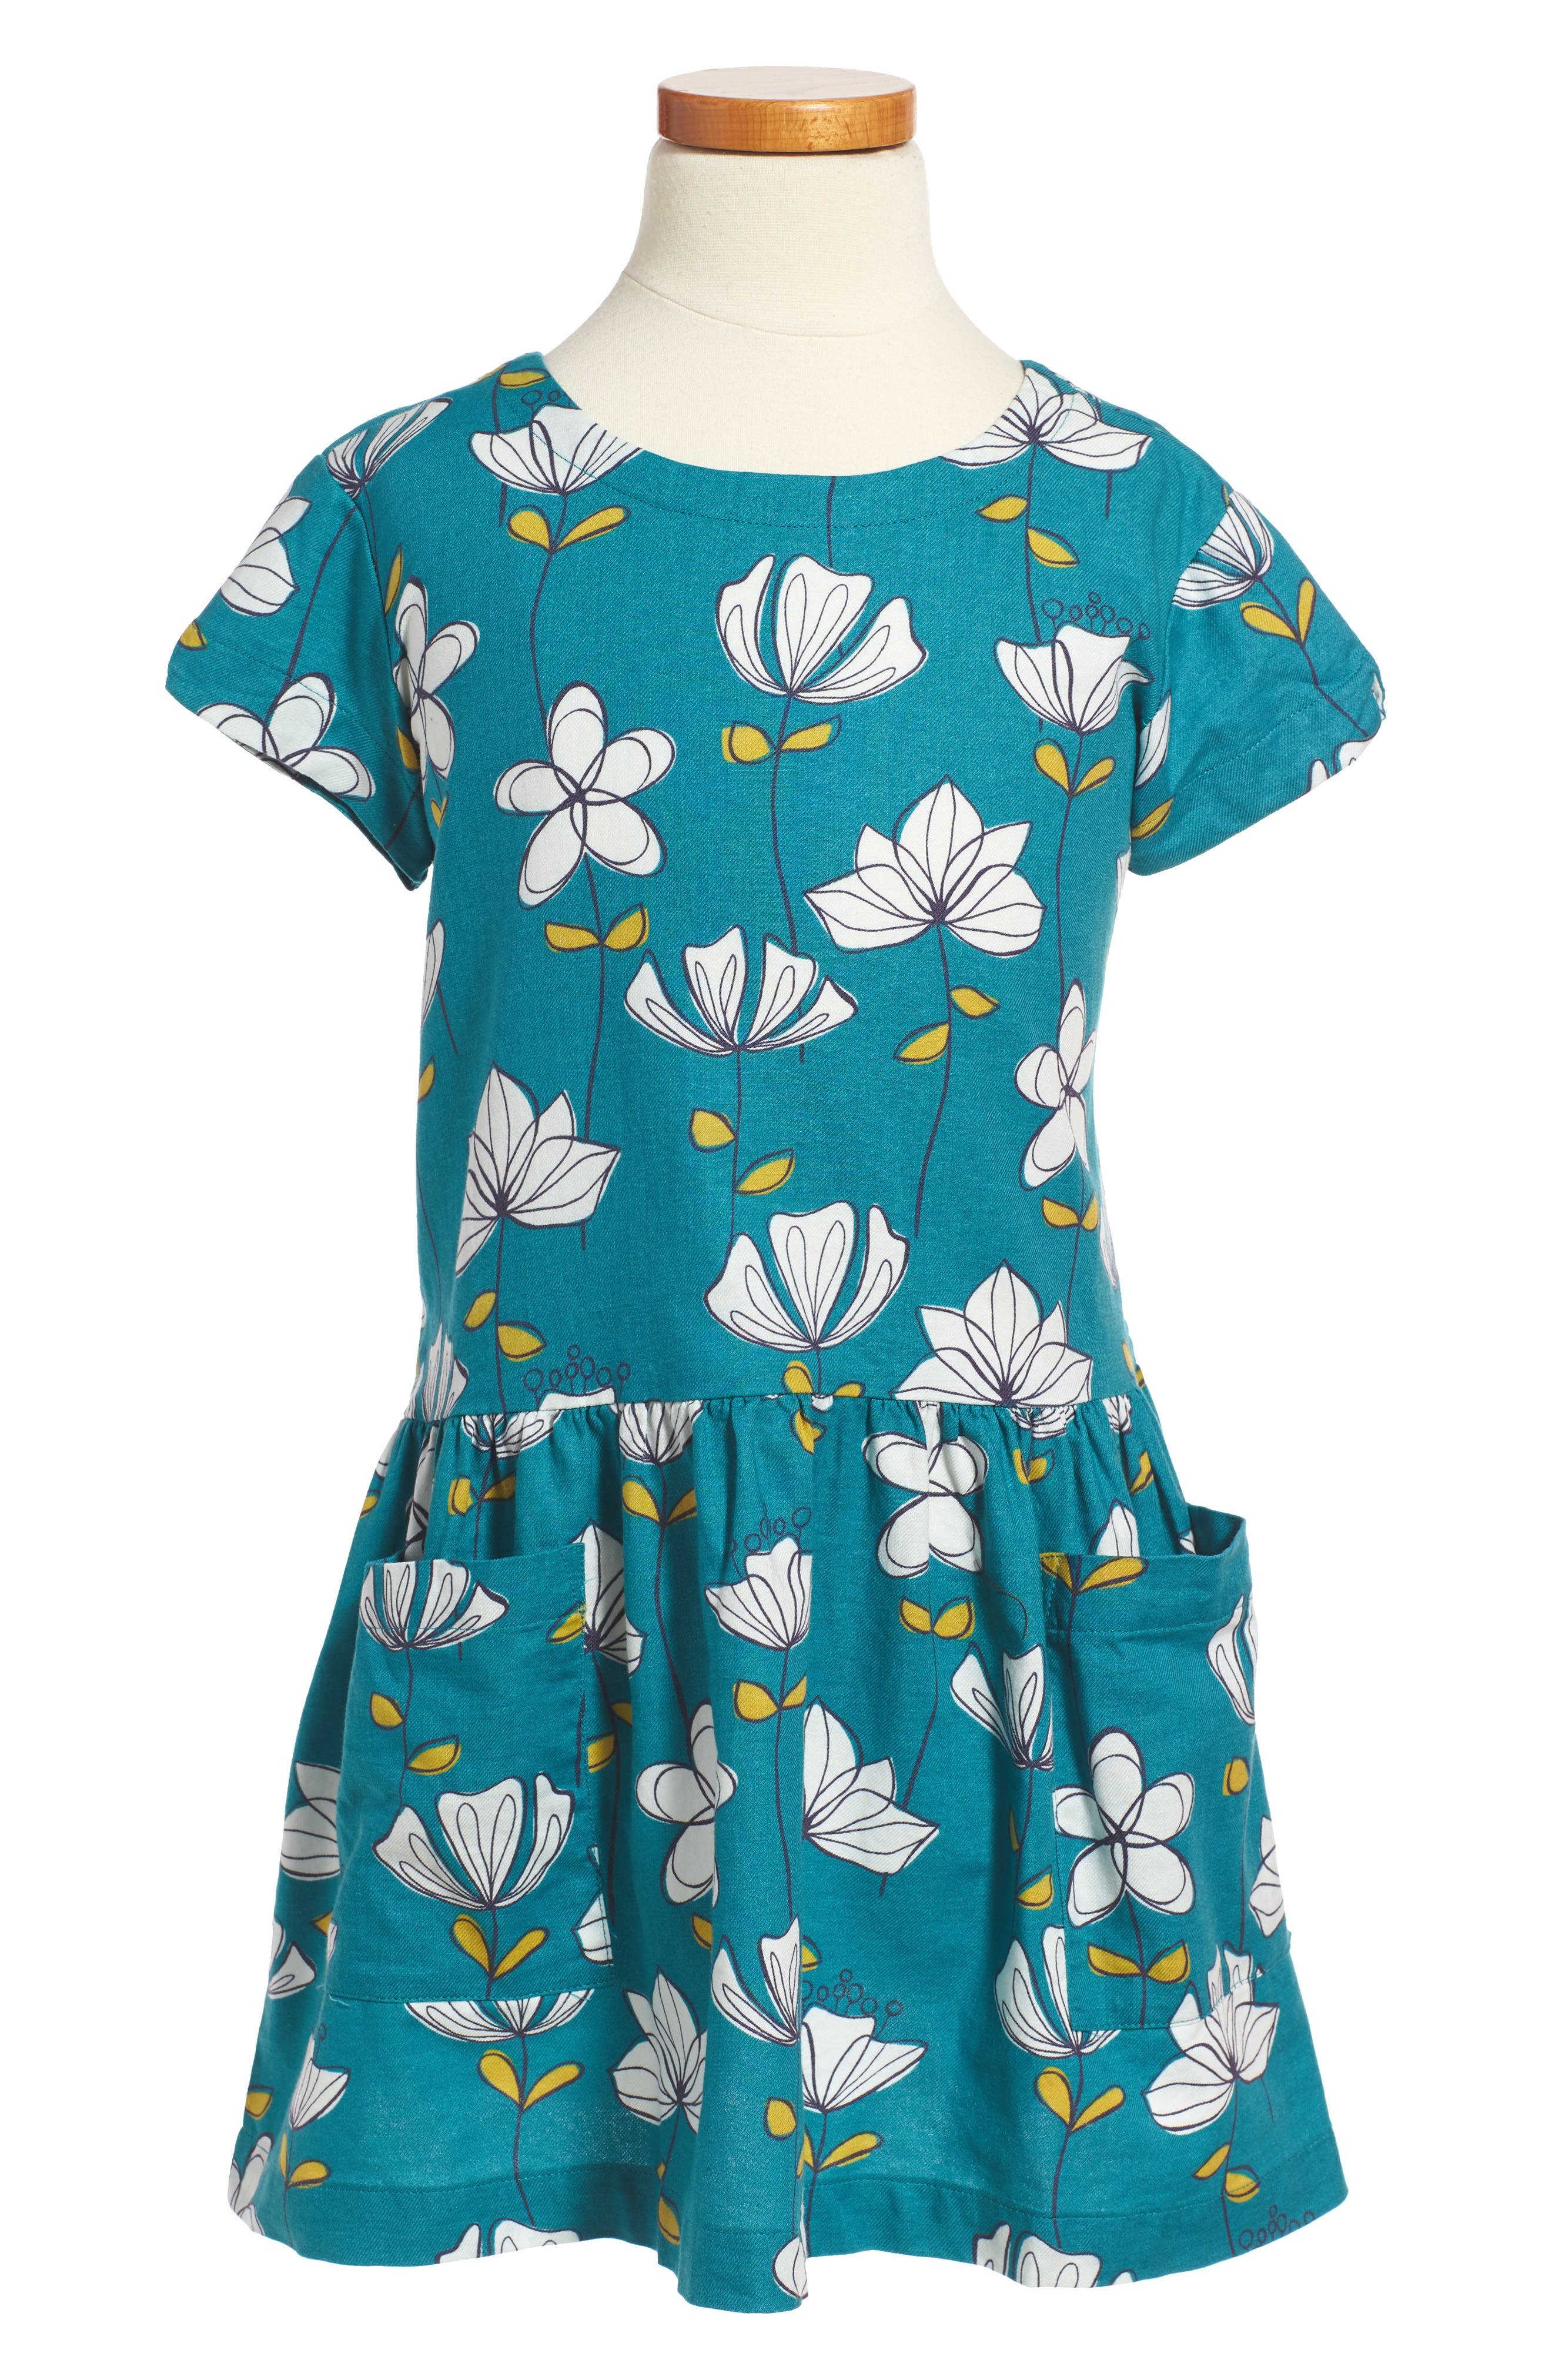 Main Image - Tea Collection Brianna Pocket Dress (Toddler Girls, Little Girls & Big Girls)